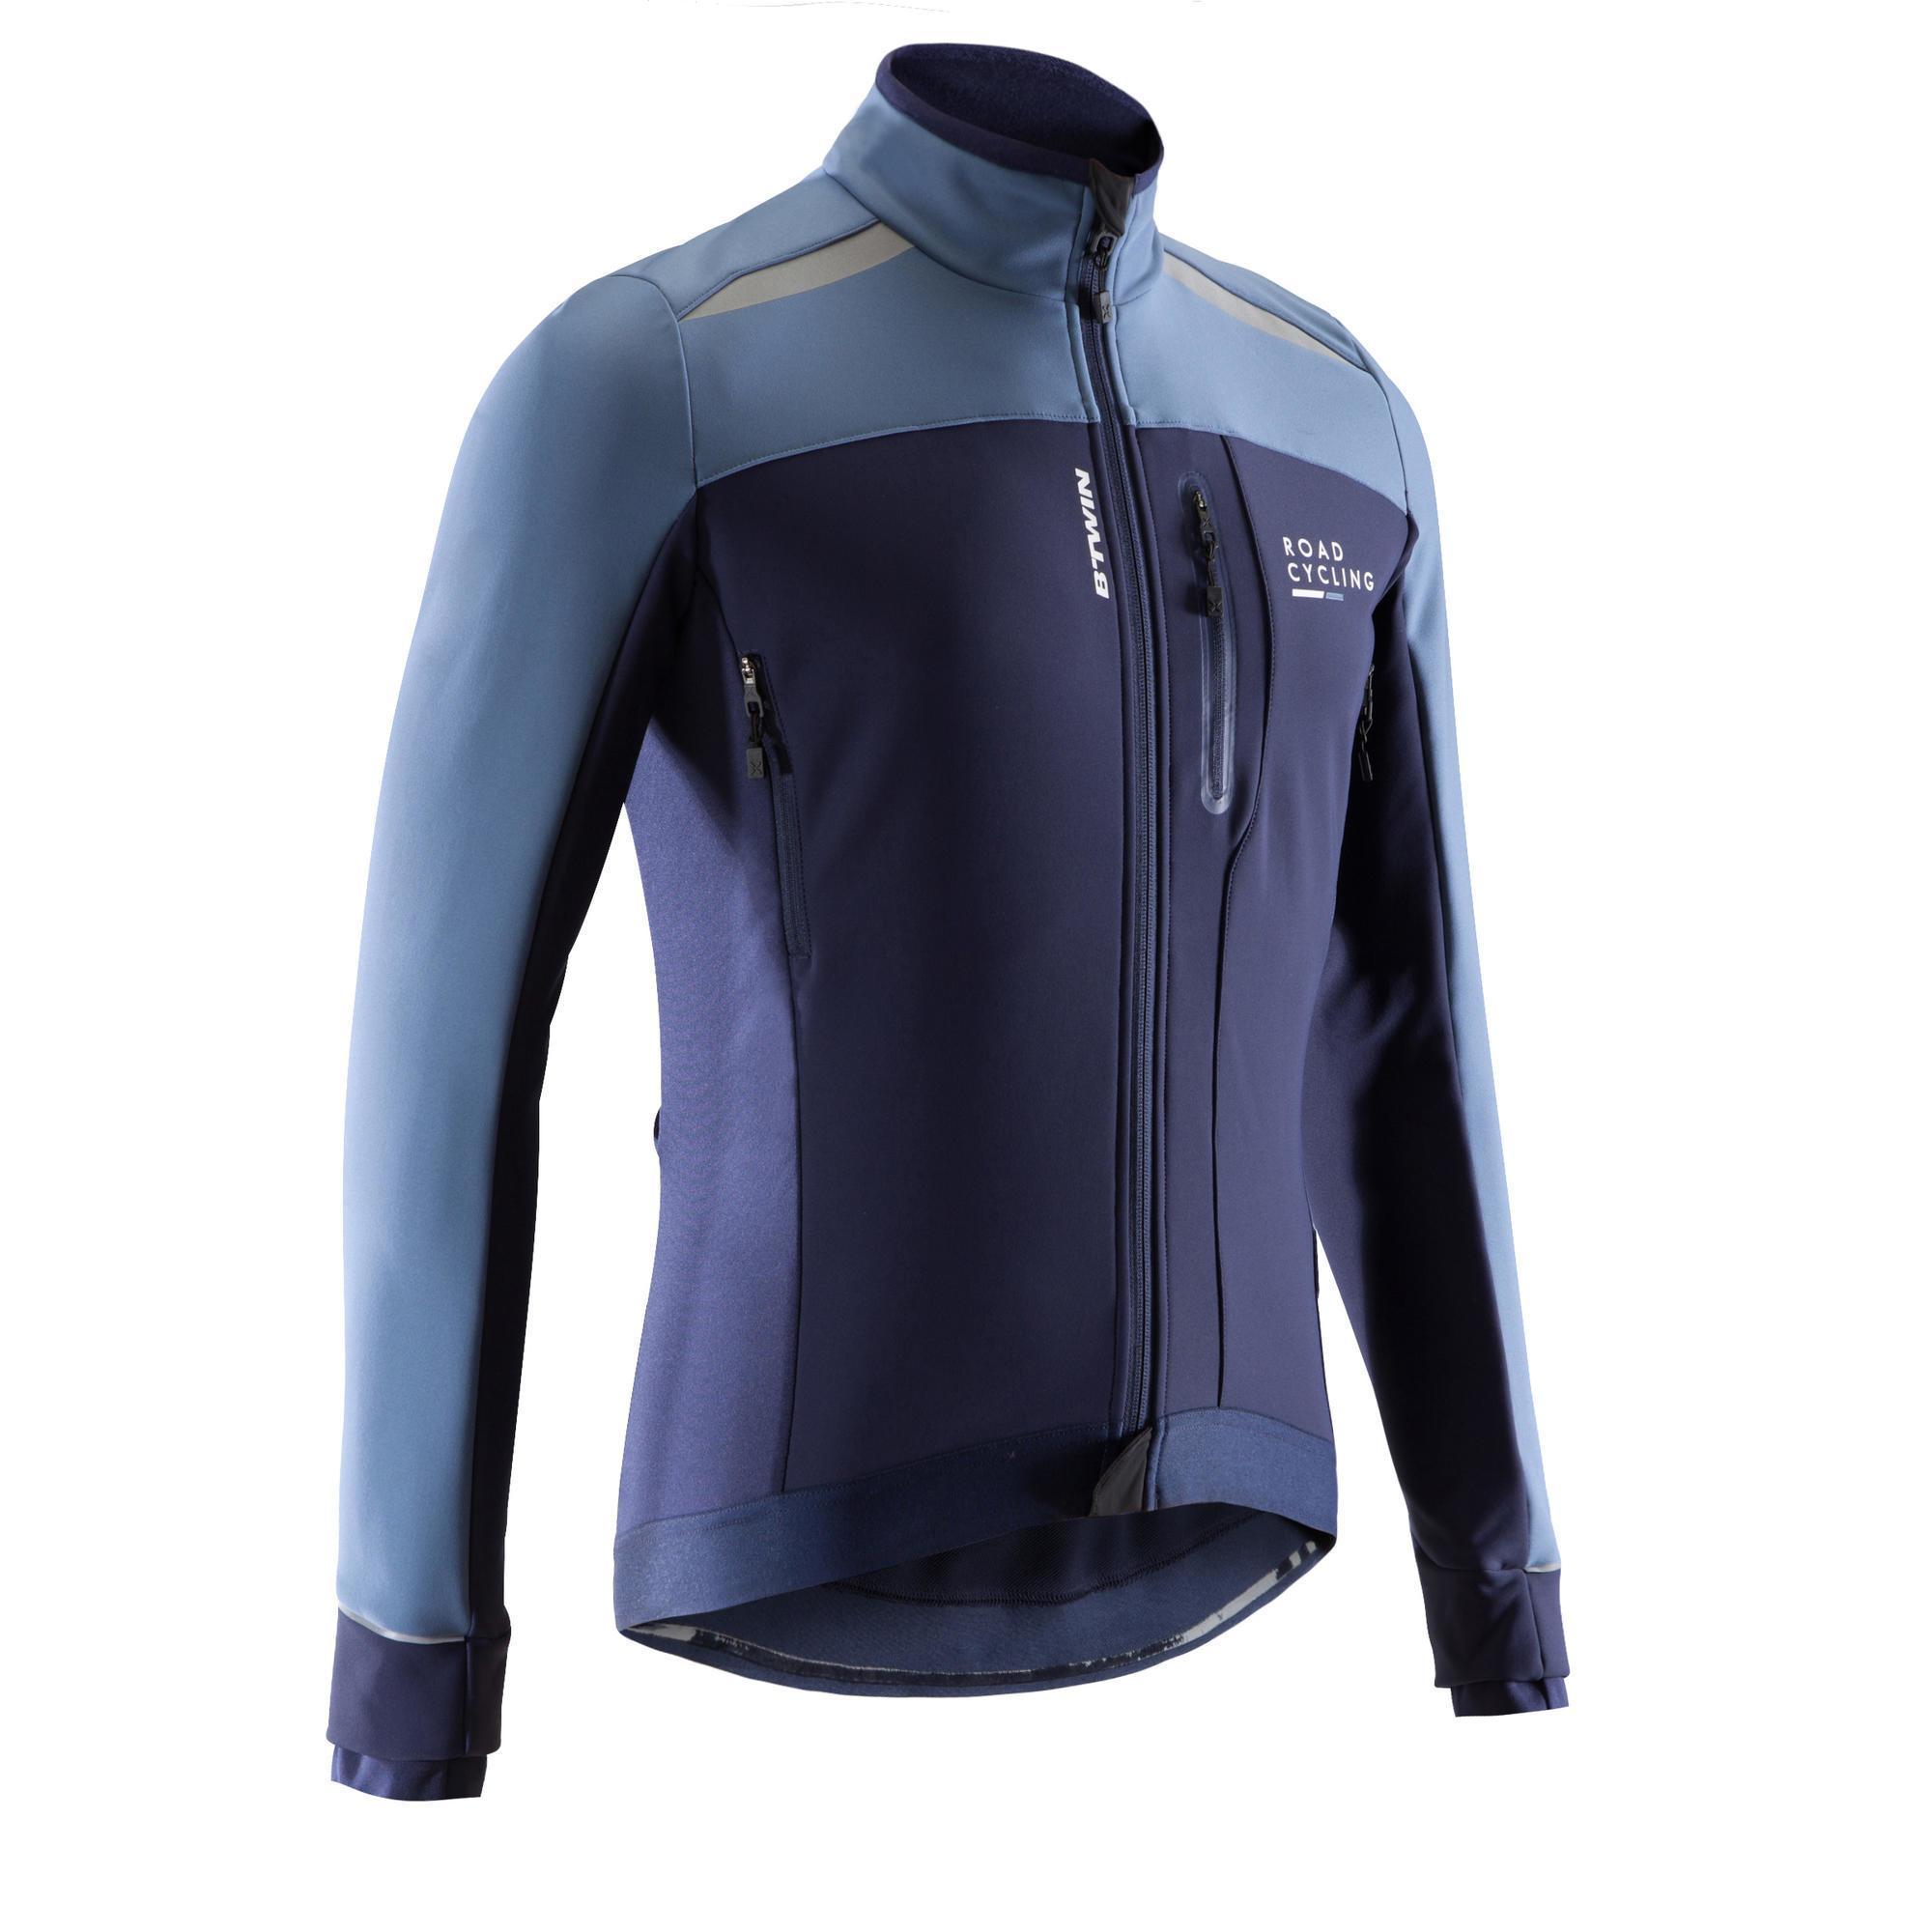 Fahrradjacke Rennrad 500 Herren marineblau   Sportbekleidung > Sportjacken > Fahrradjacken   B'twin